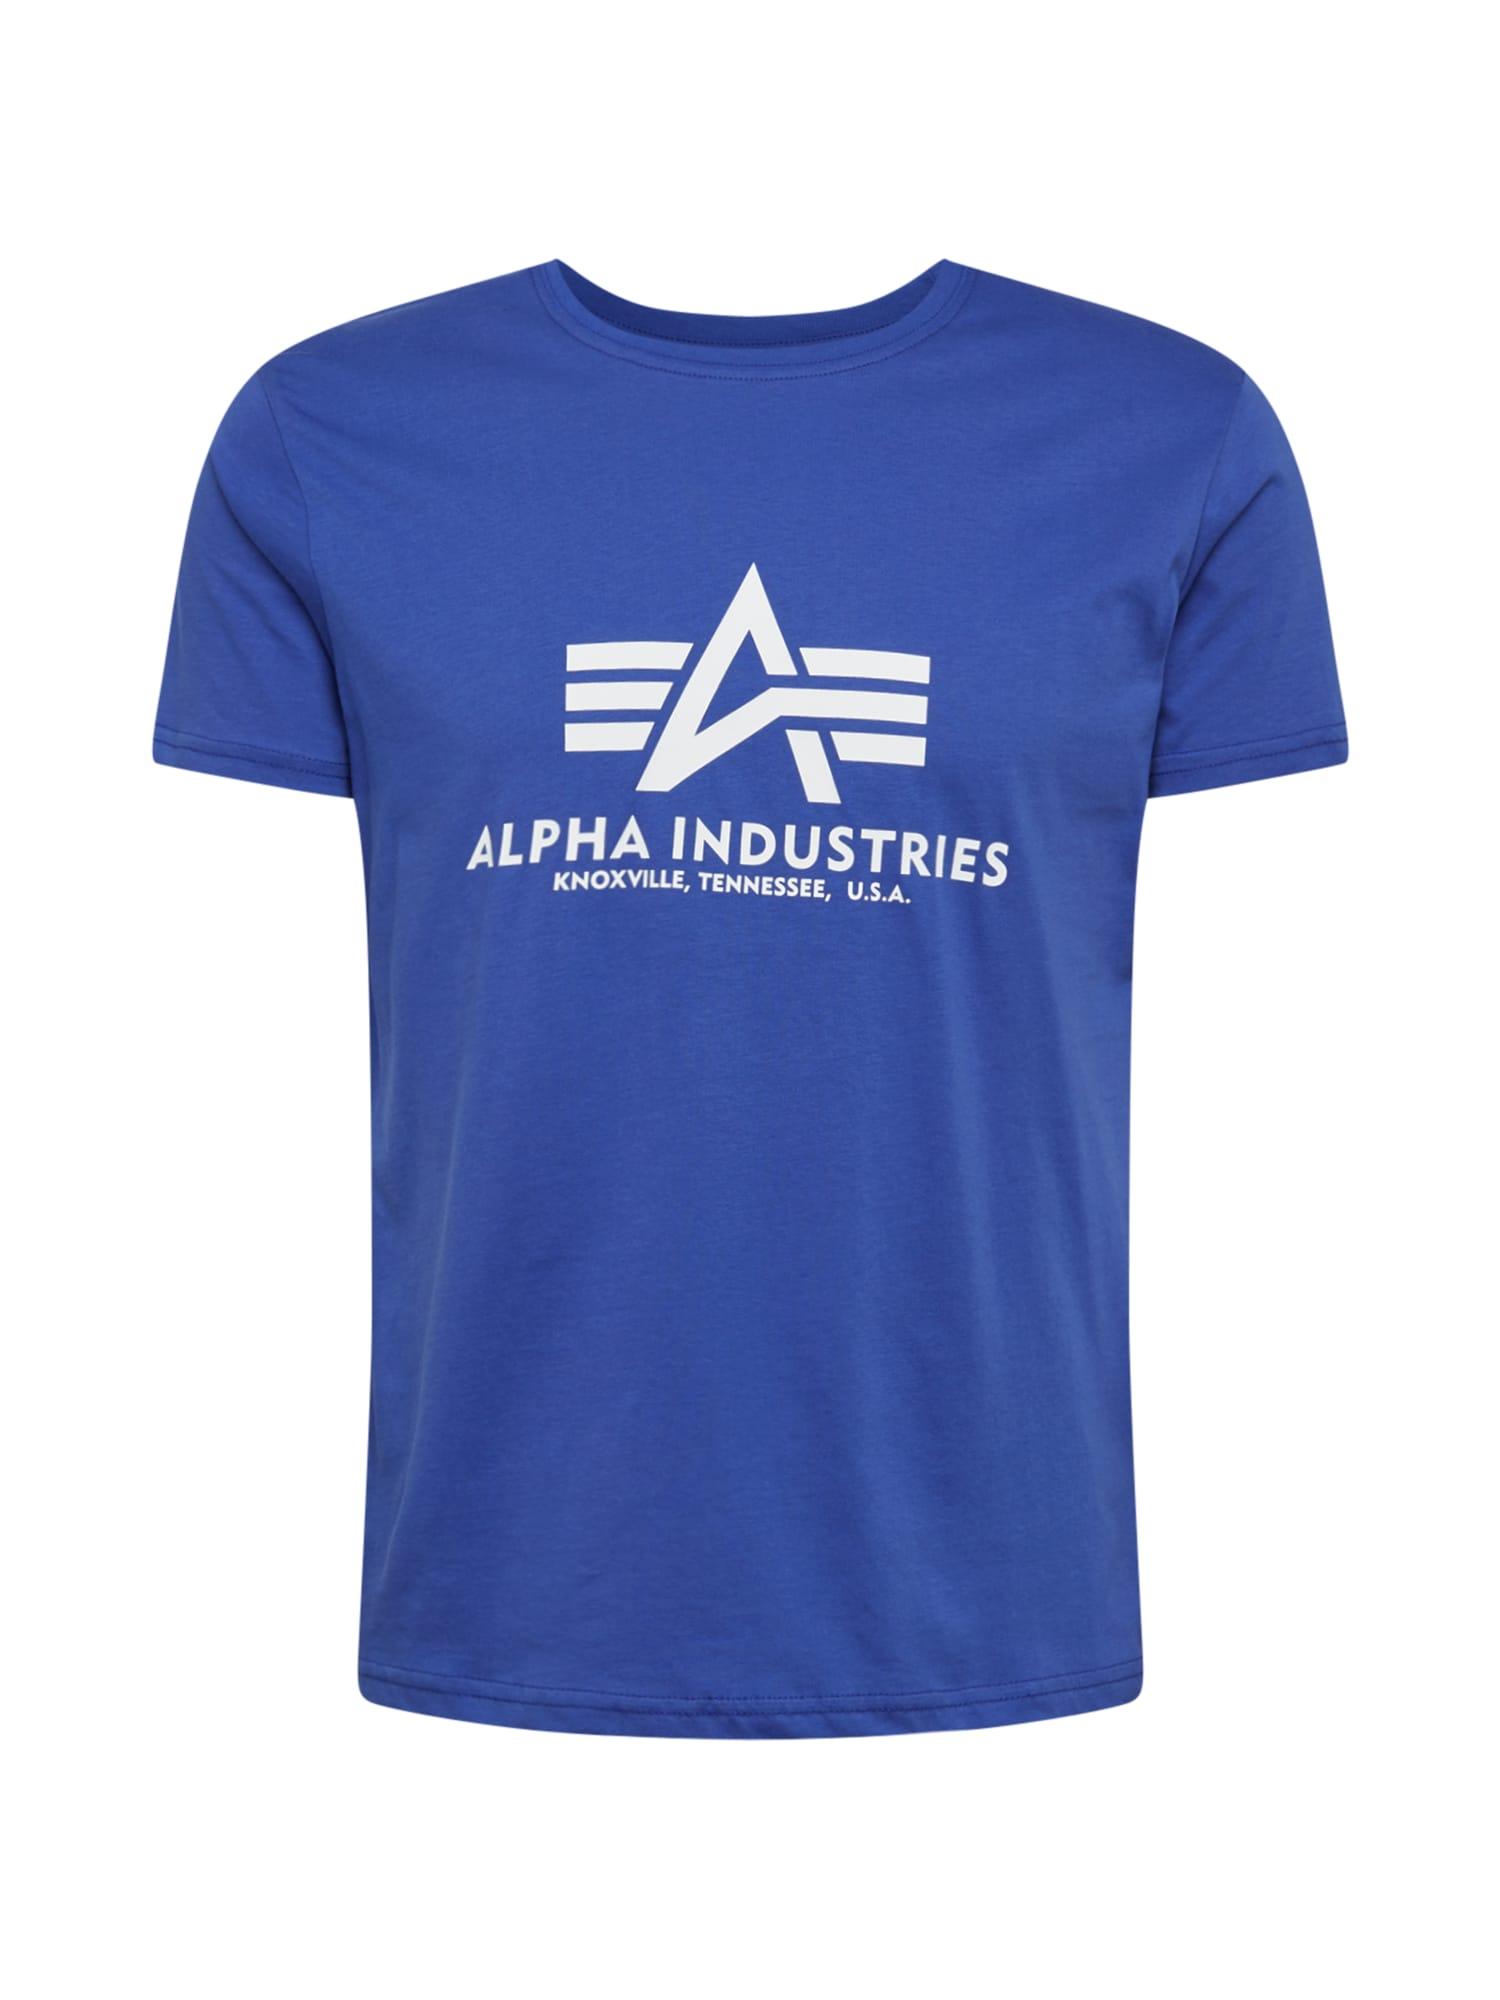 ALPHA INDUSTRIES Marškinėliai balta / mėlyna